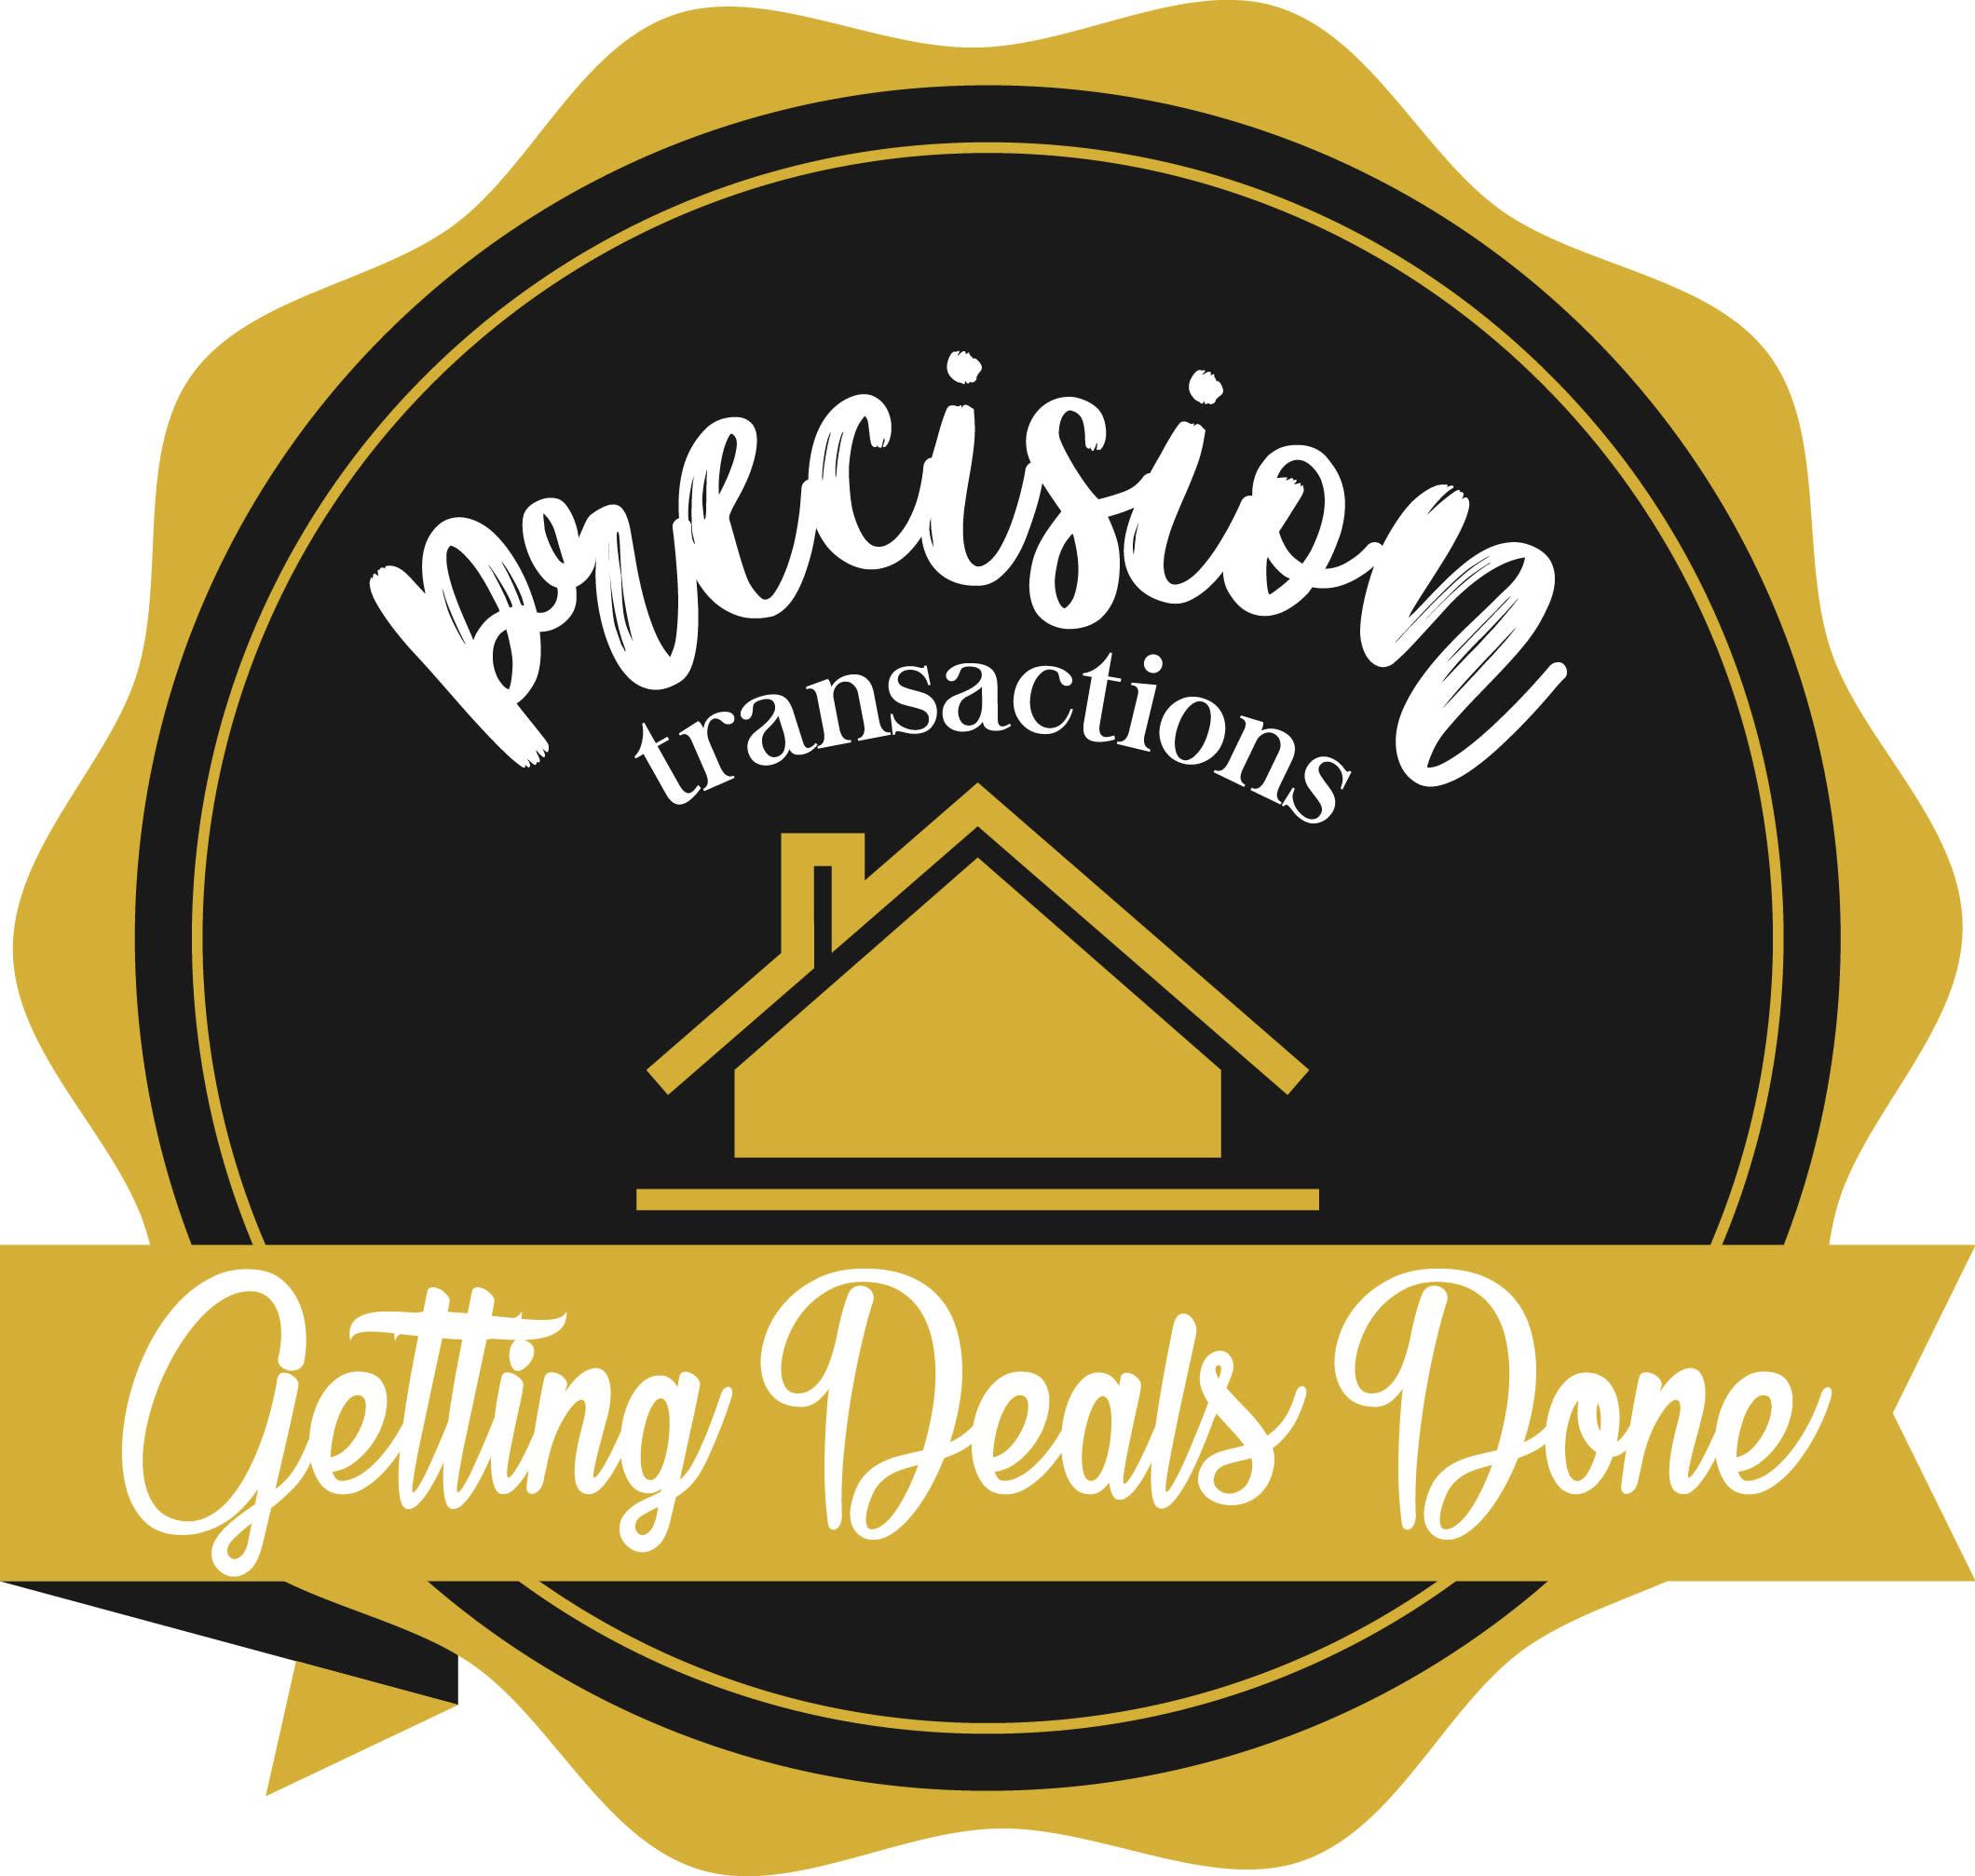 Precision Transactions, LLC